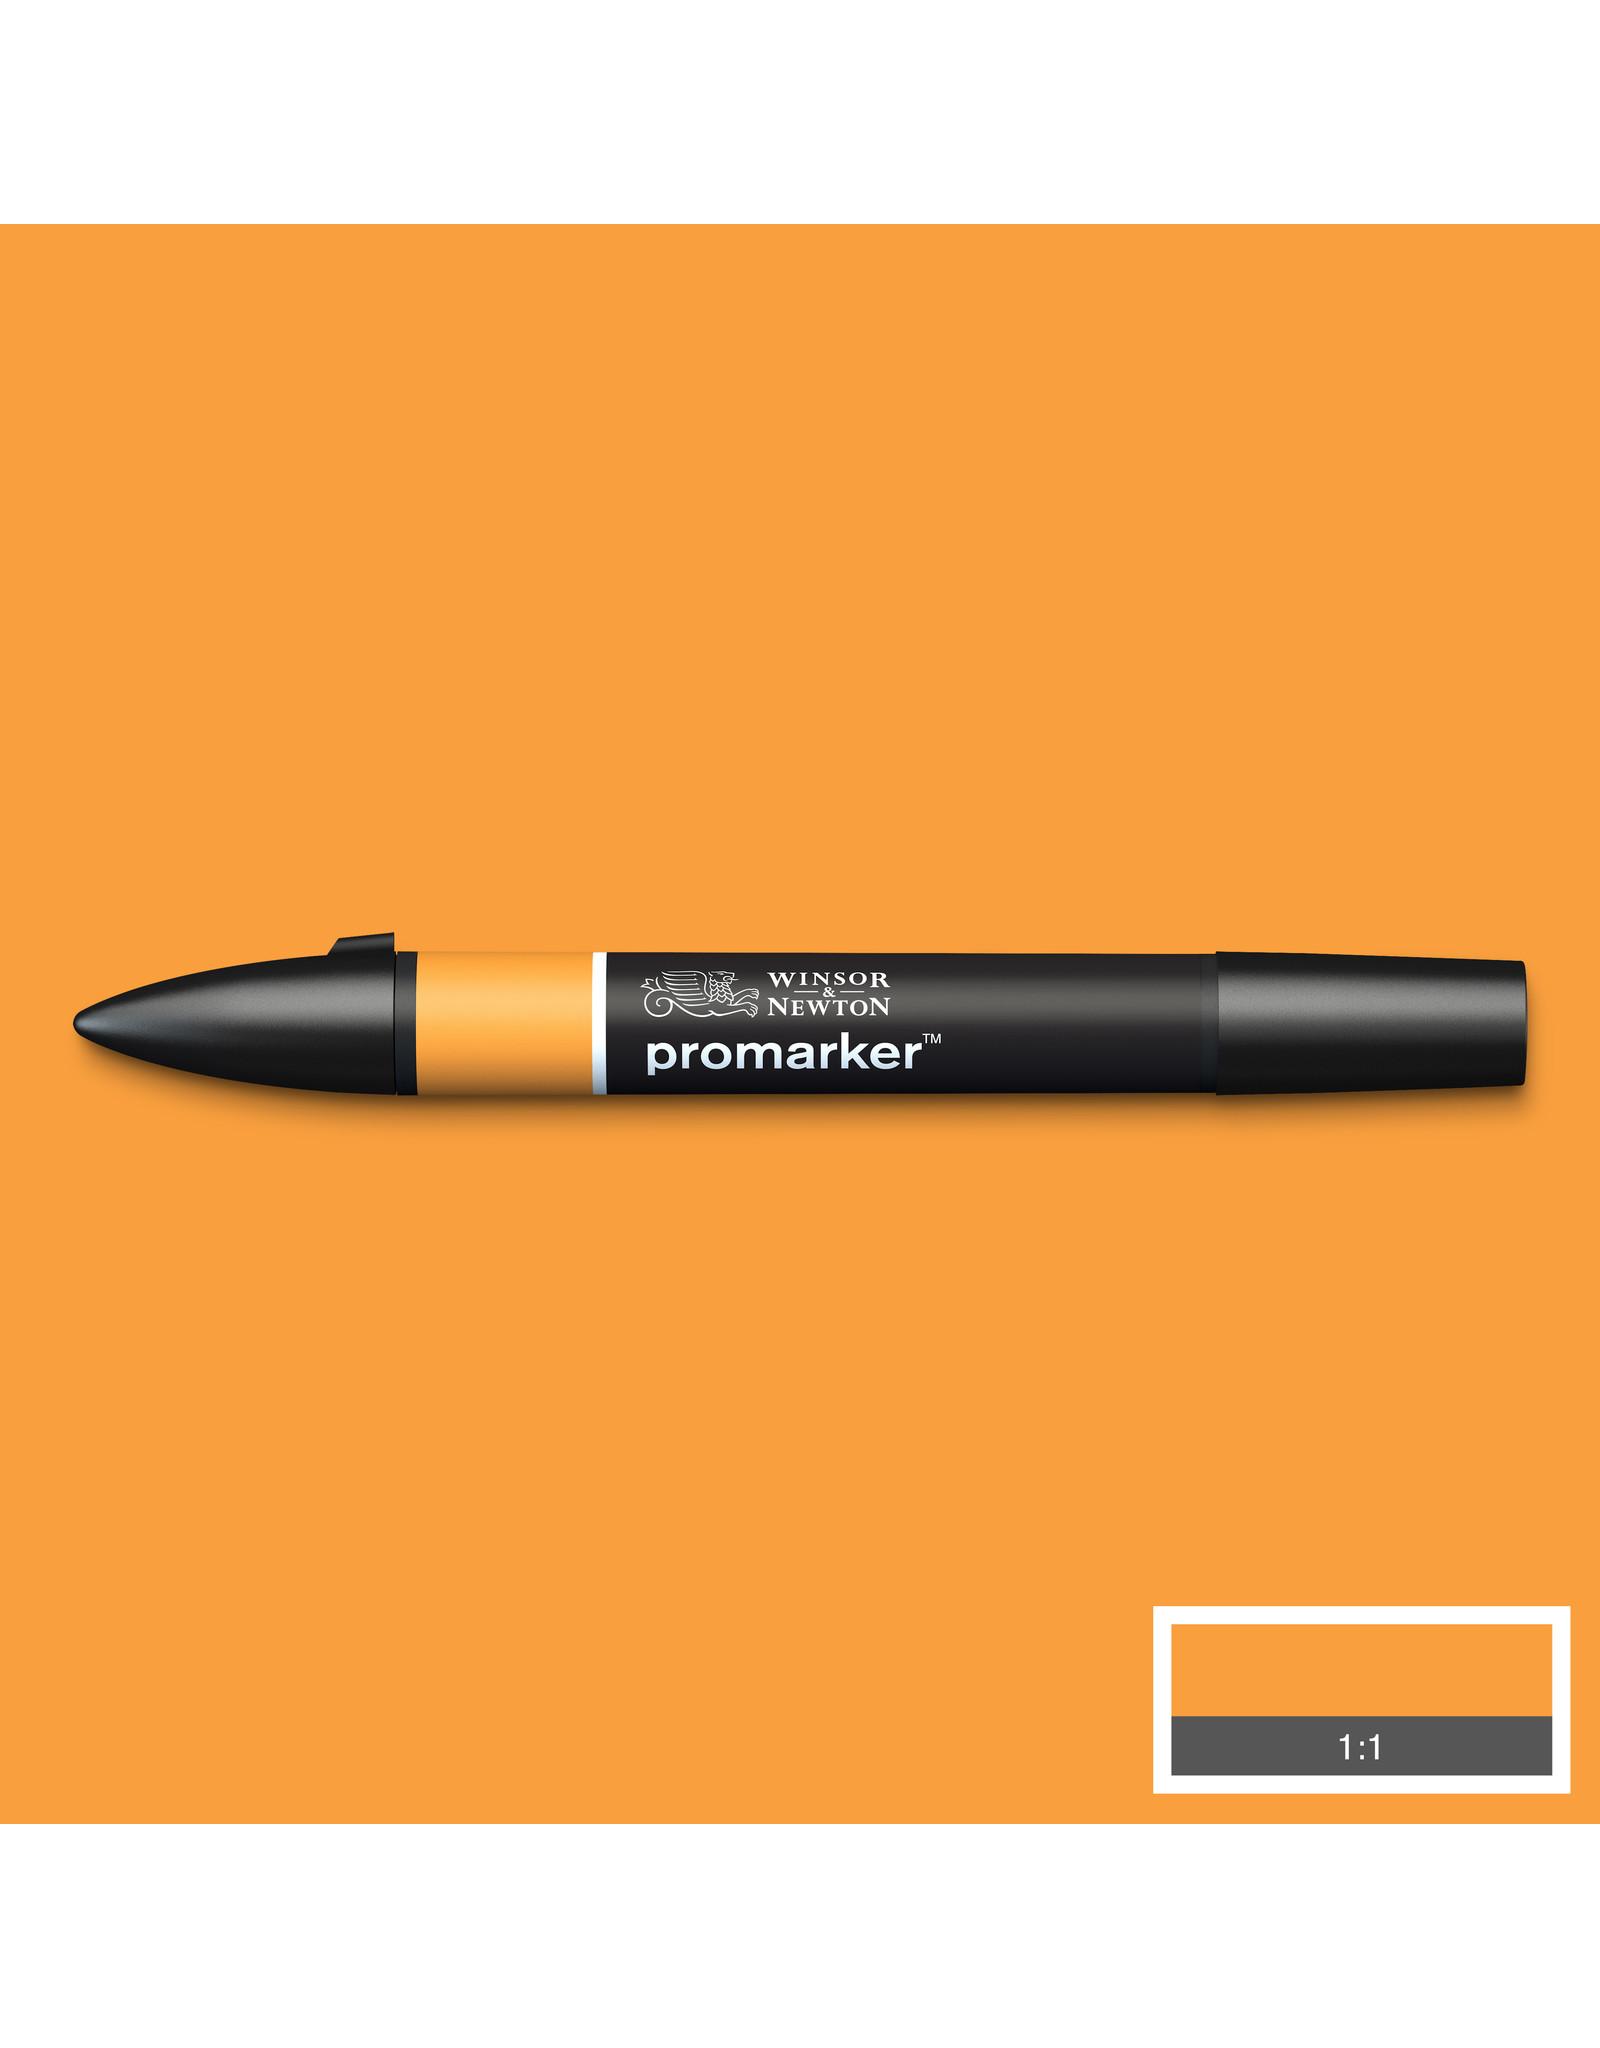 Honeycomb - promarker